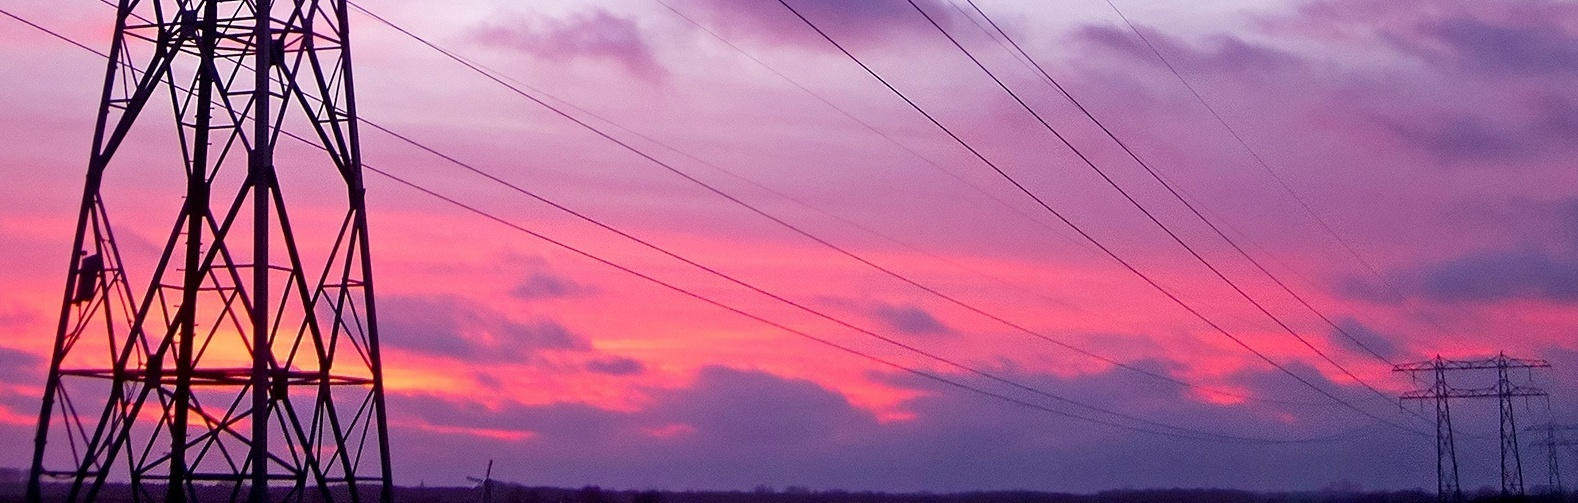 powerlines-sunset-114356-edited.jpg